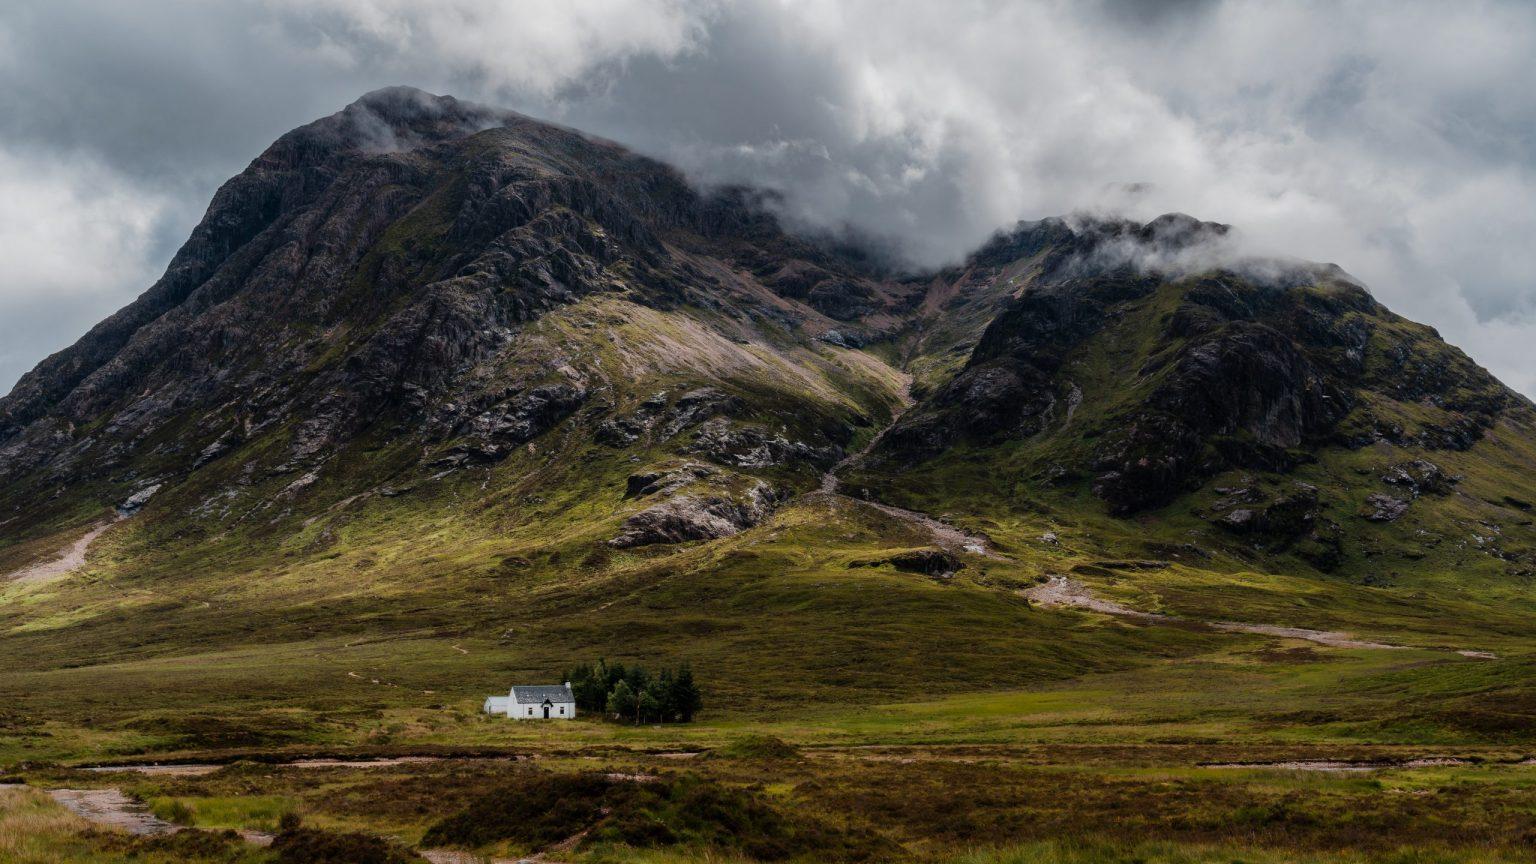 Little white house below Buachaille Etive Mòr, in Glencoe, in the Scottish Highlands in Scotland.